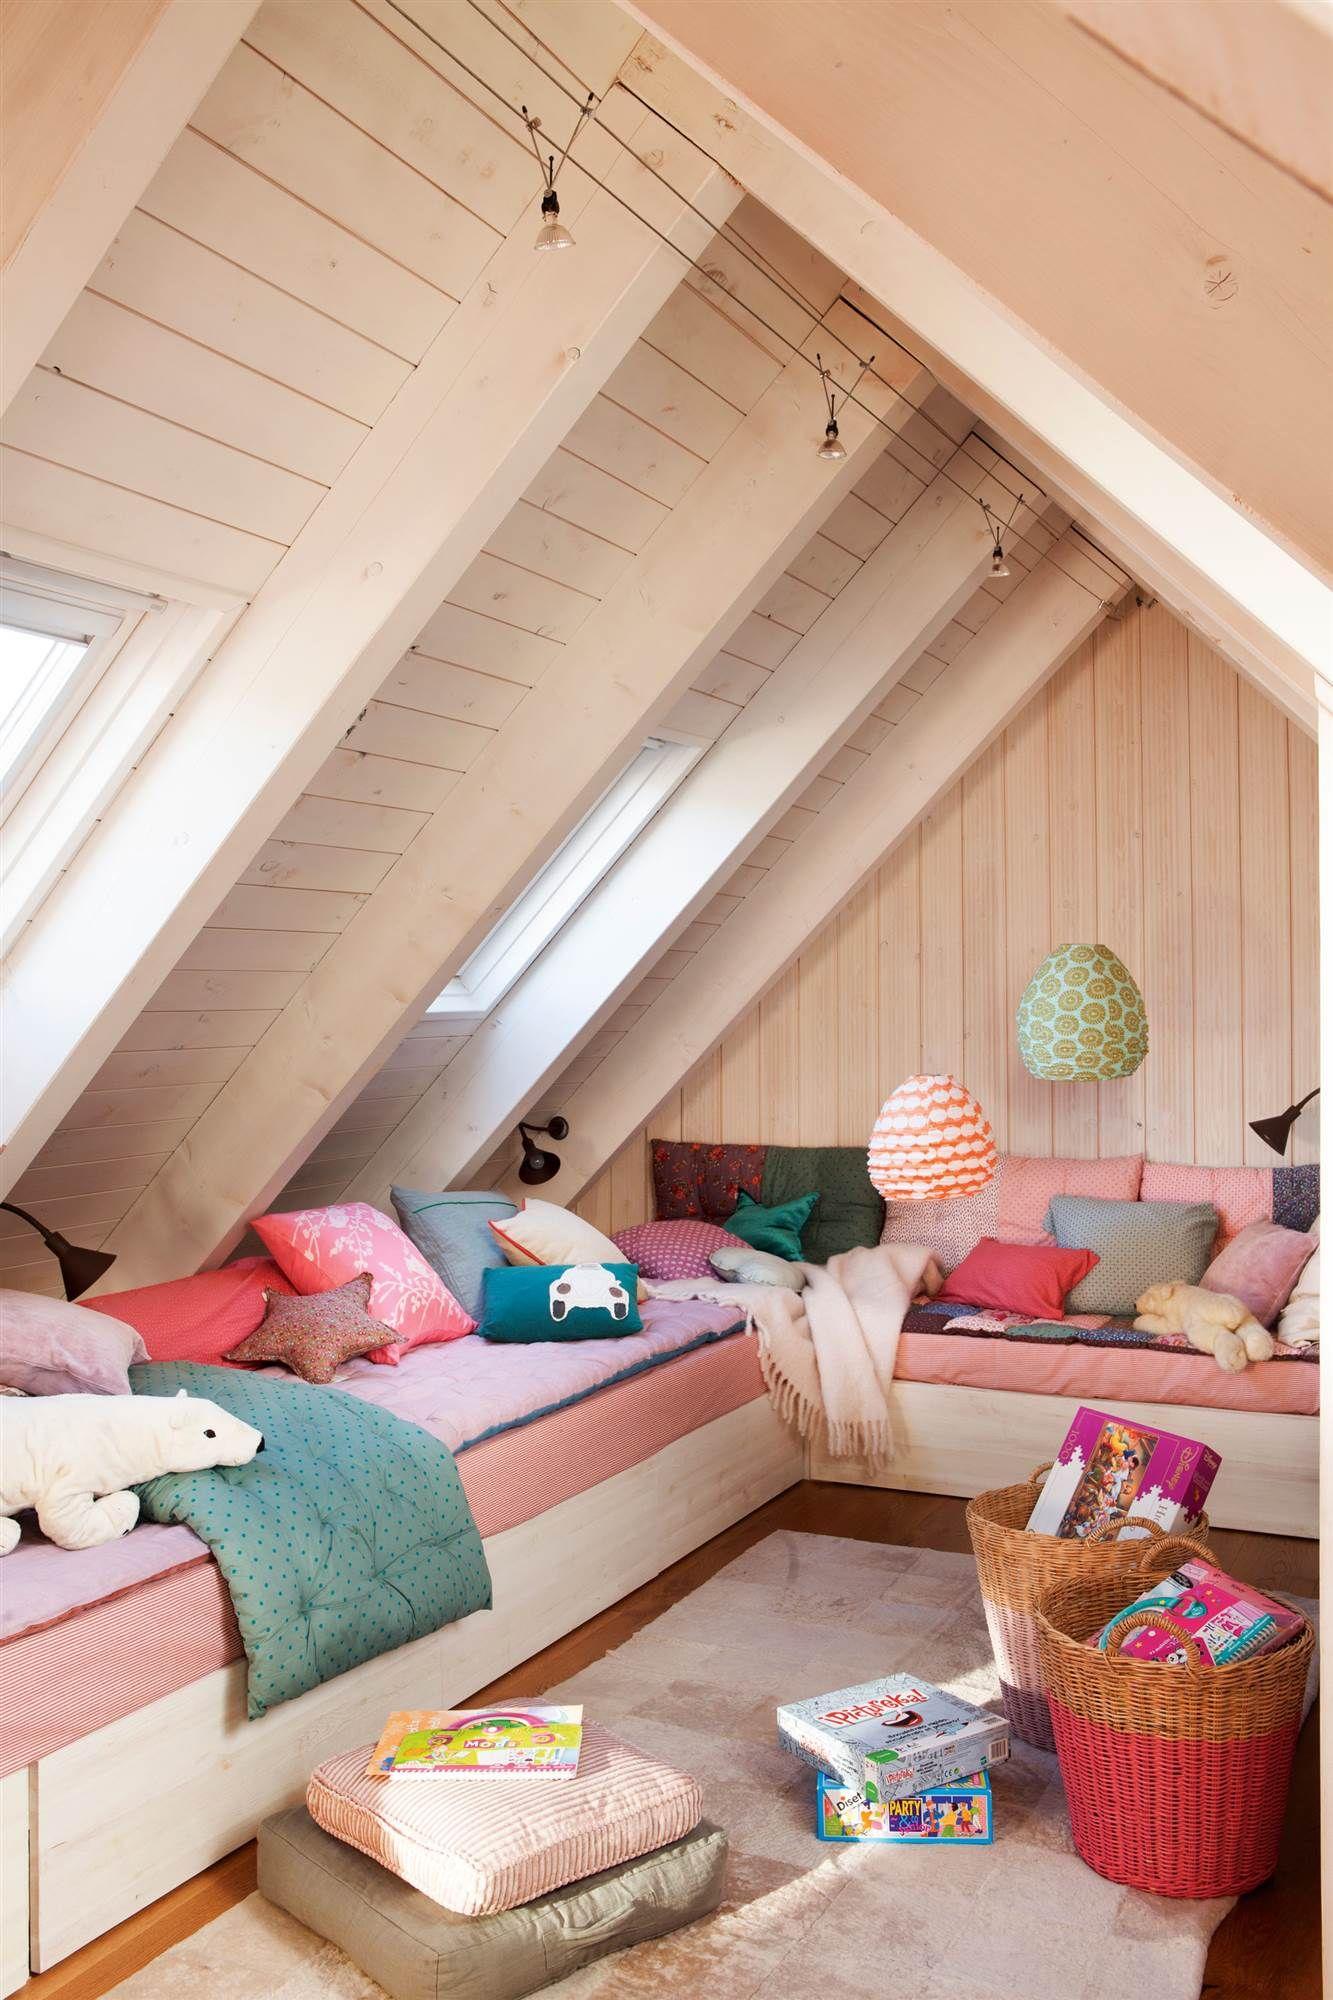 Cama Buhardilla Ikea Muebles Dormitorio Wwwmiifotoscom